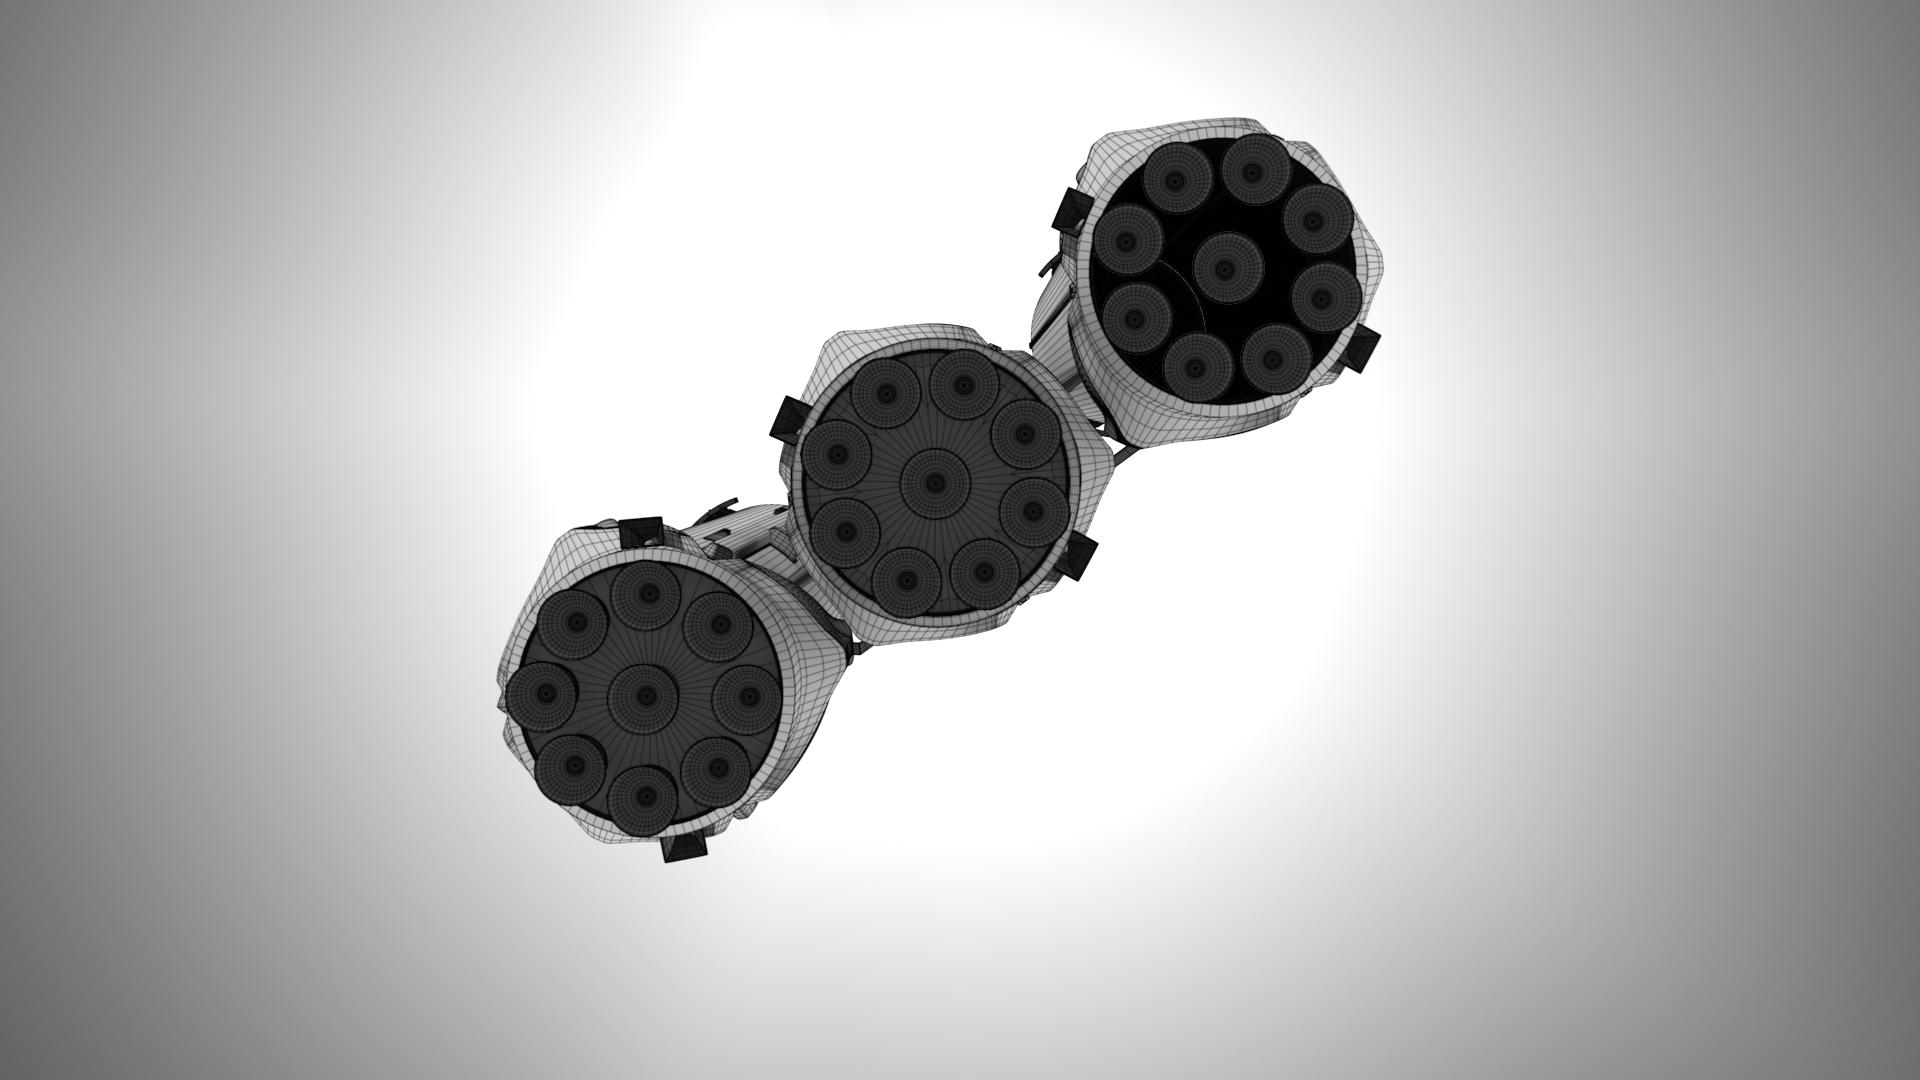 falcon heavy v1.2 3d model max fbx c4d lwo ma mb hrc xsi obj 277826